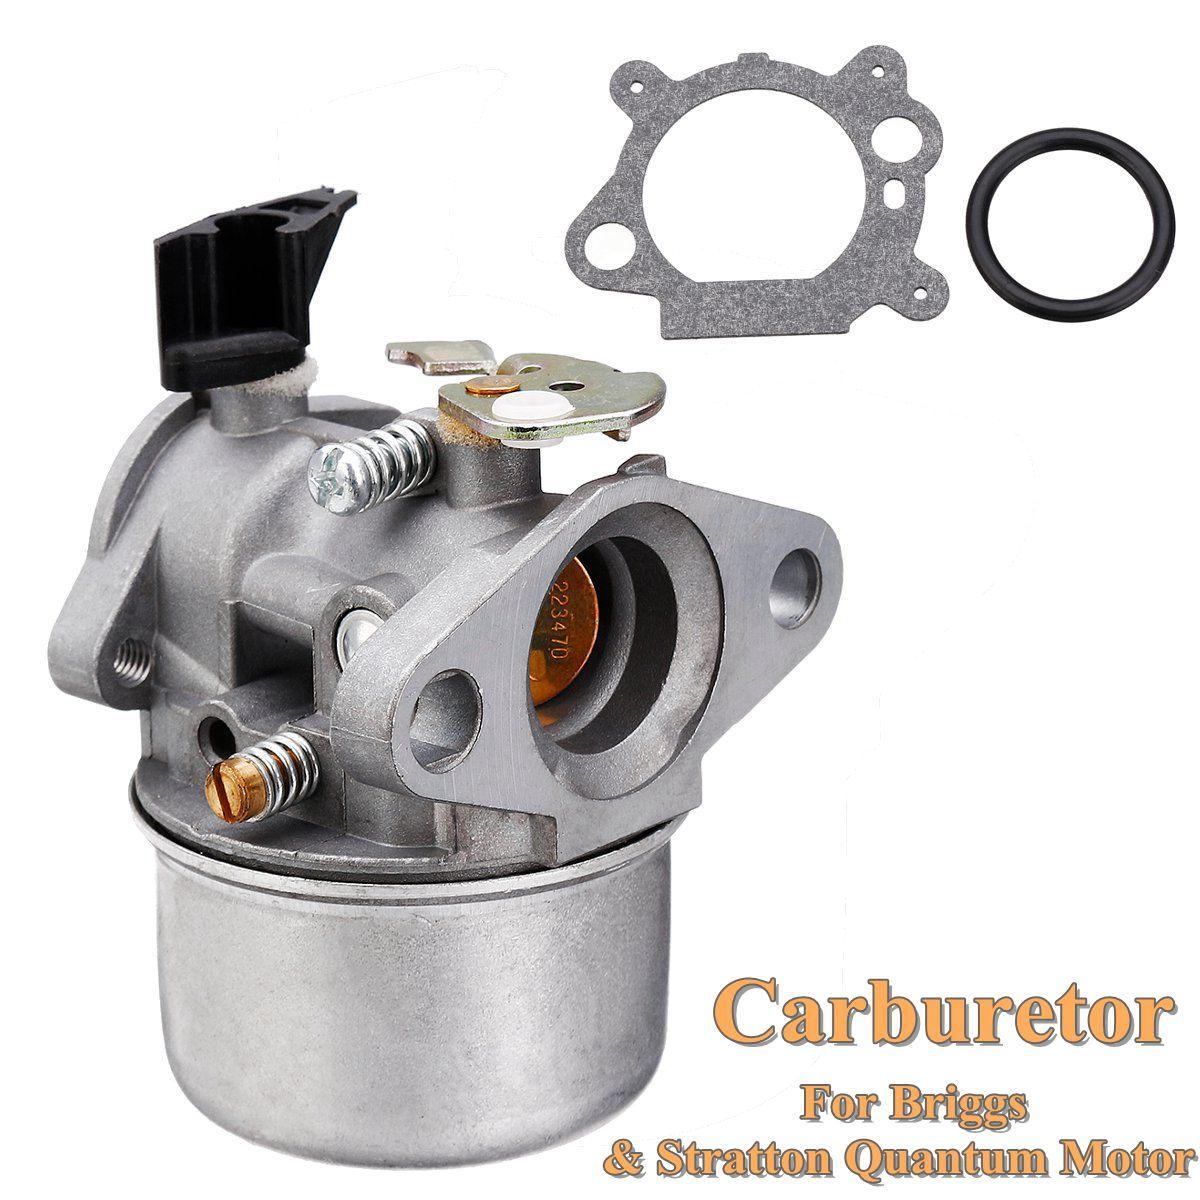 1 Pcs Choke Vergaser Carburateur Carburetor Briggs Stratton Quantum And Diagram Motor 498965 With Gasket Rubber Ring In Carburetors From Automobiles Motorcycles